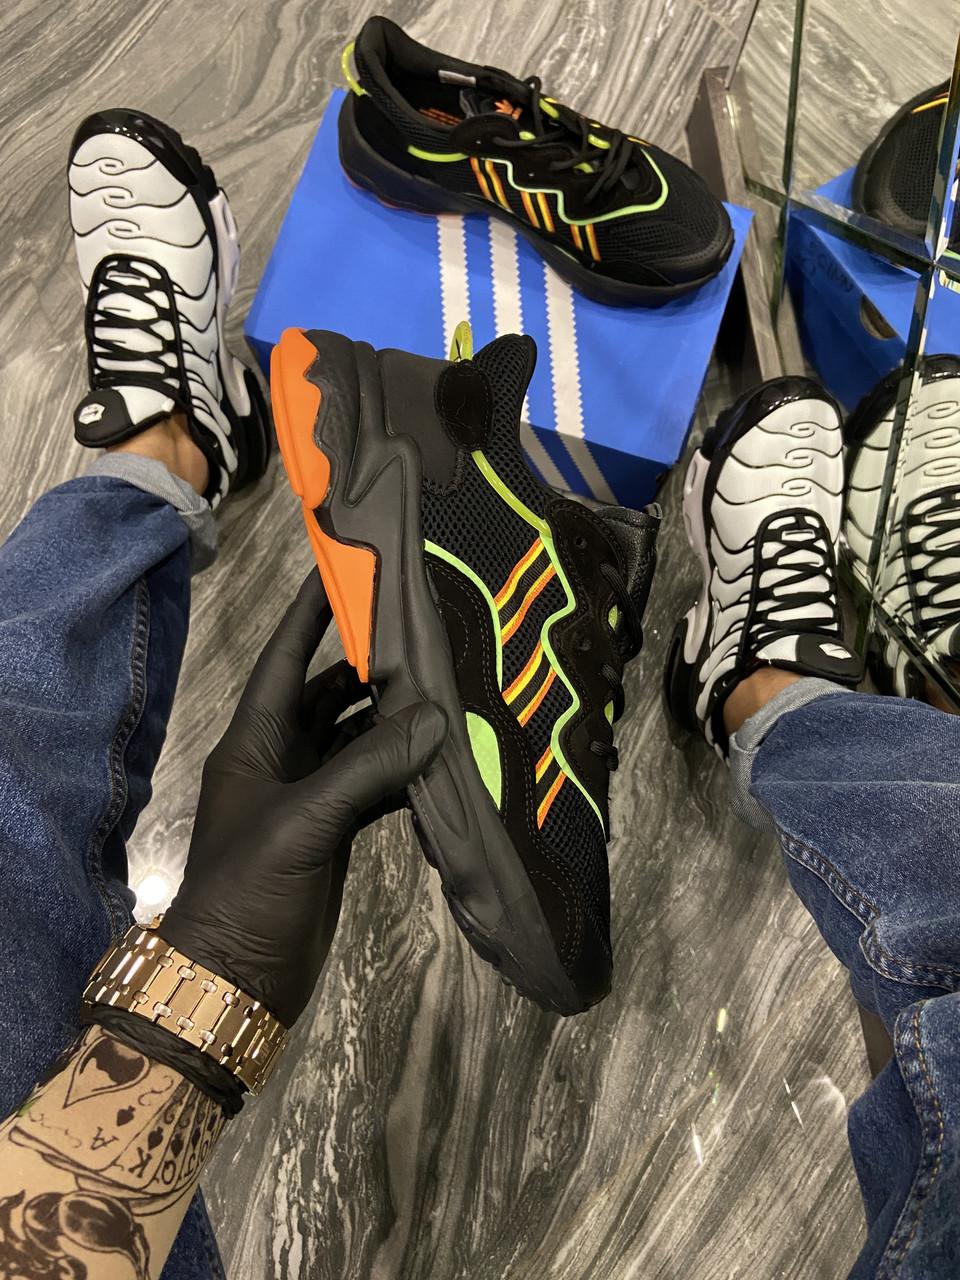 Ad!id@s, крос, обувь, взуття, sneakers, шузы, Ozweego Black (Чёрный)